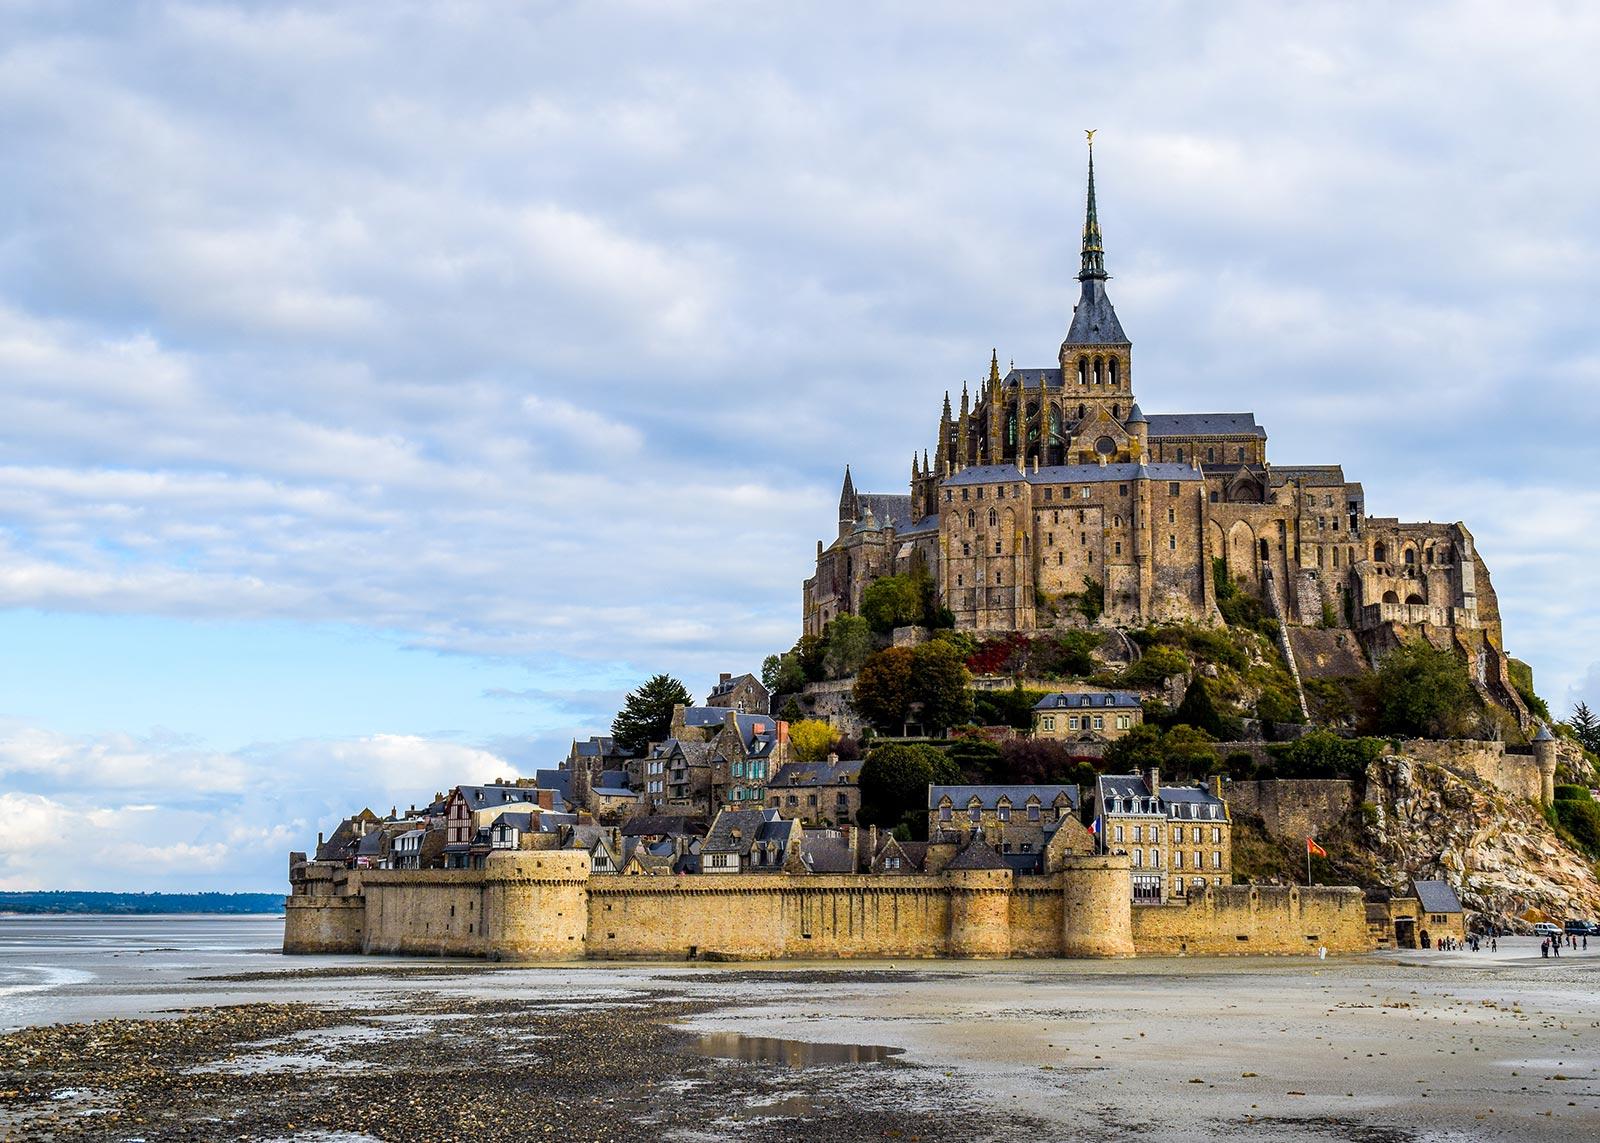 mont saint michel - overseas travel